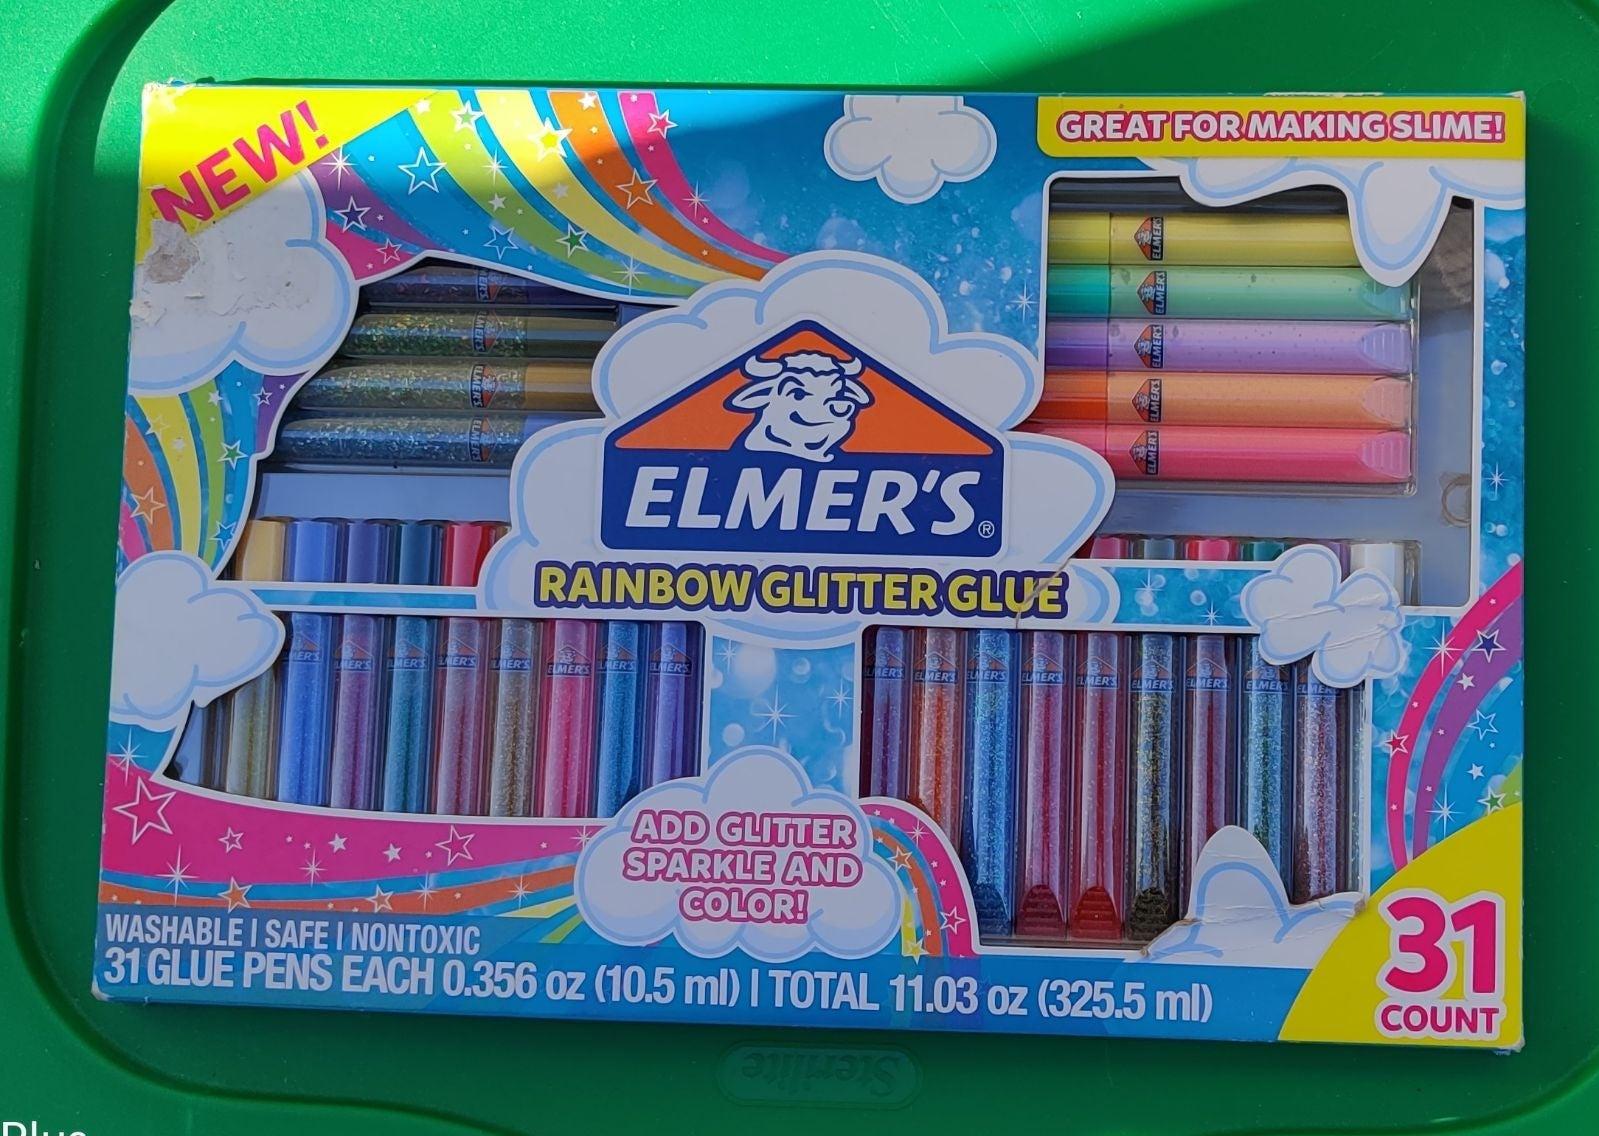 Elmer's Rainbow Glitter Glue 31 count